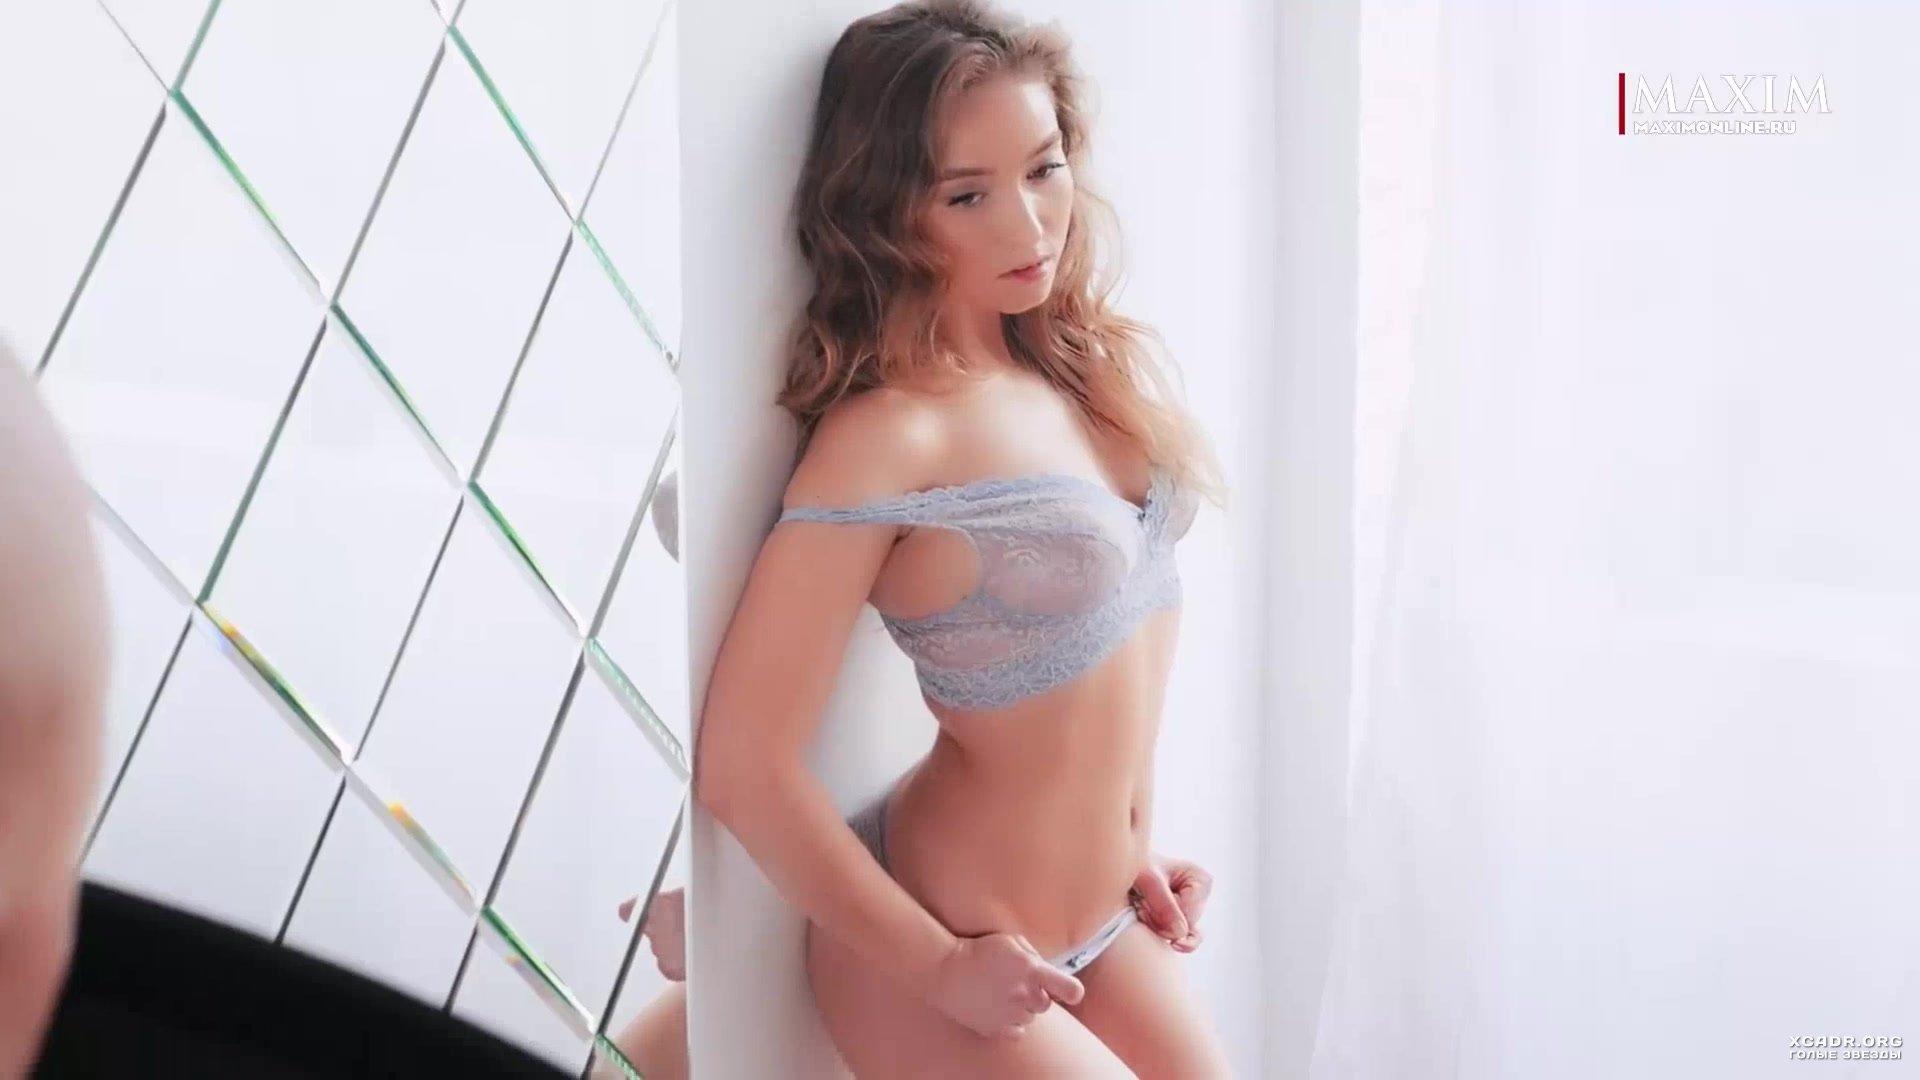 Юлия Маргулис Обнаженная